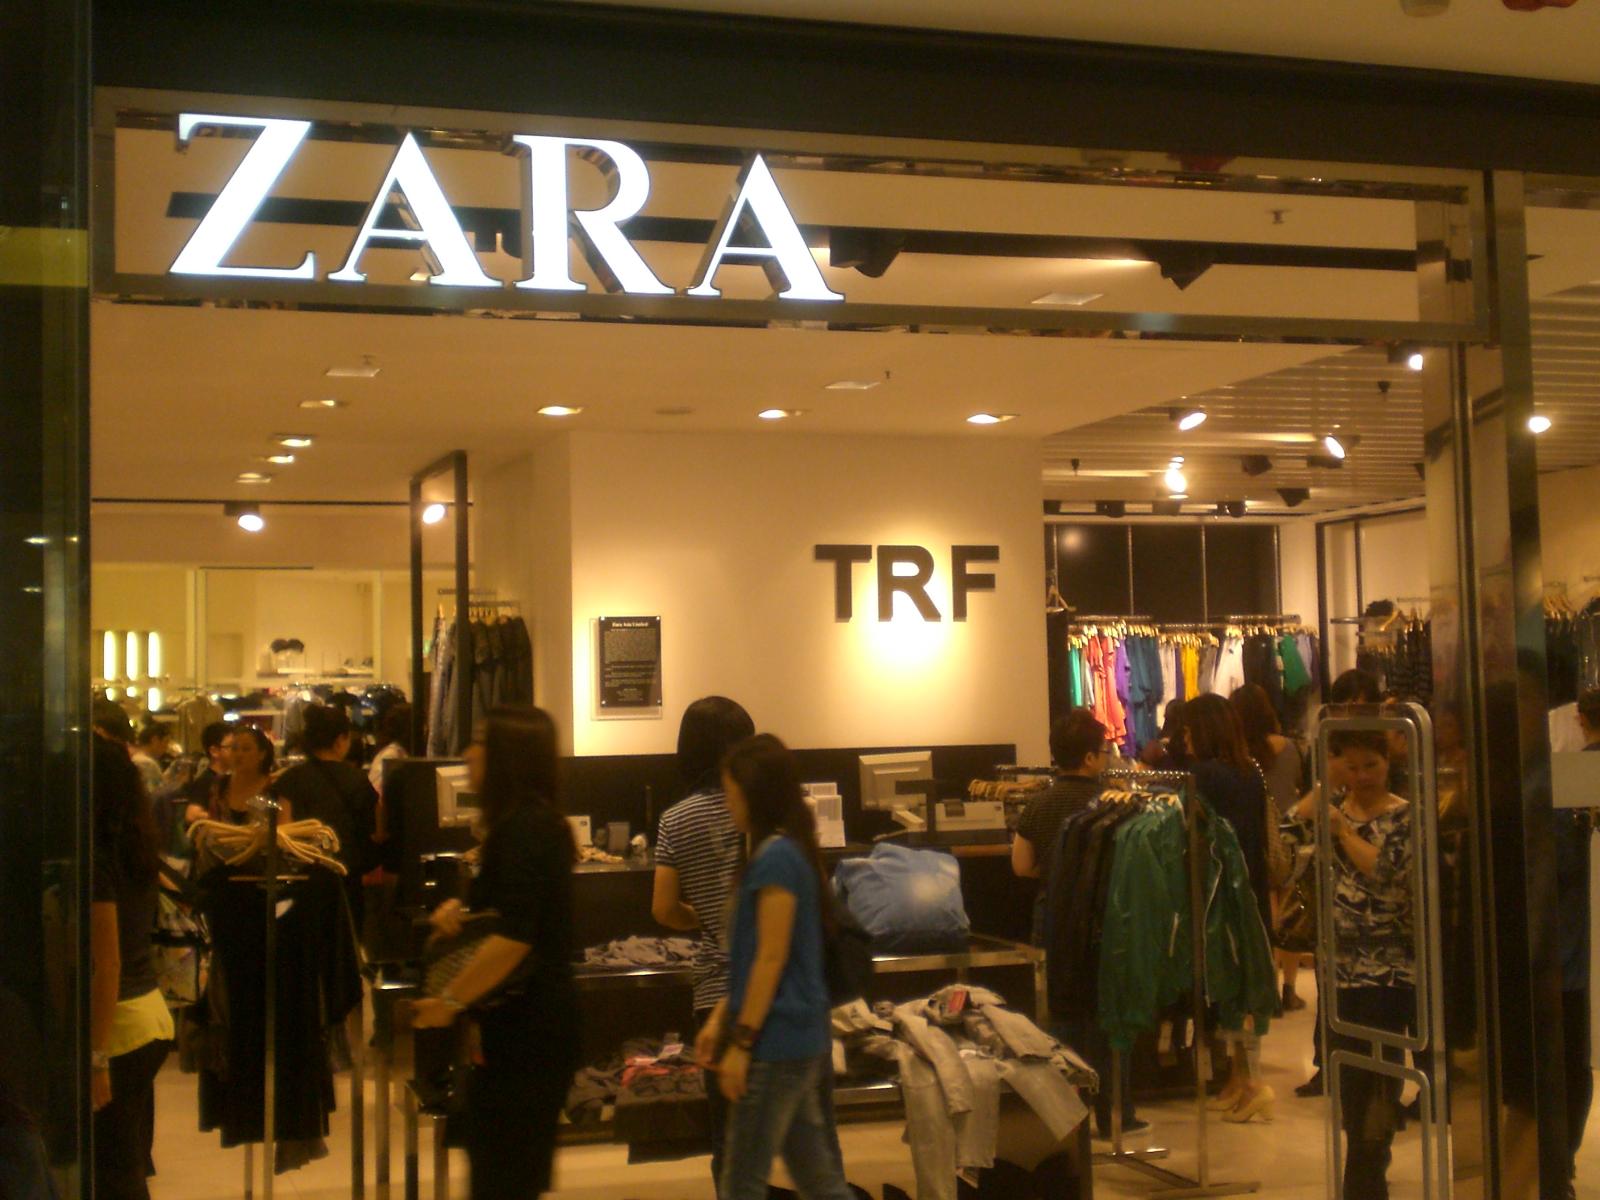 zara shop: